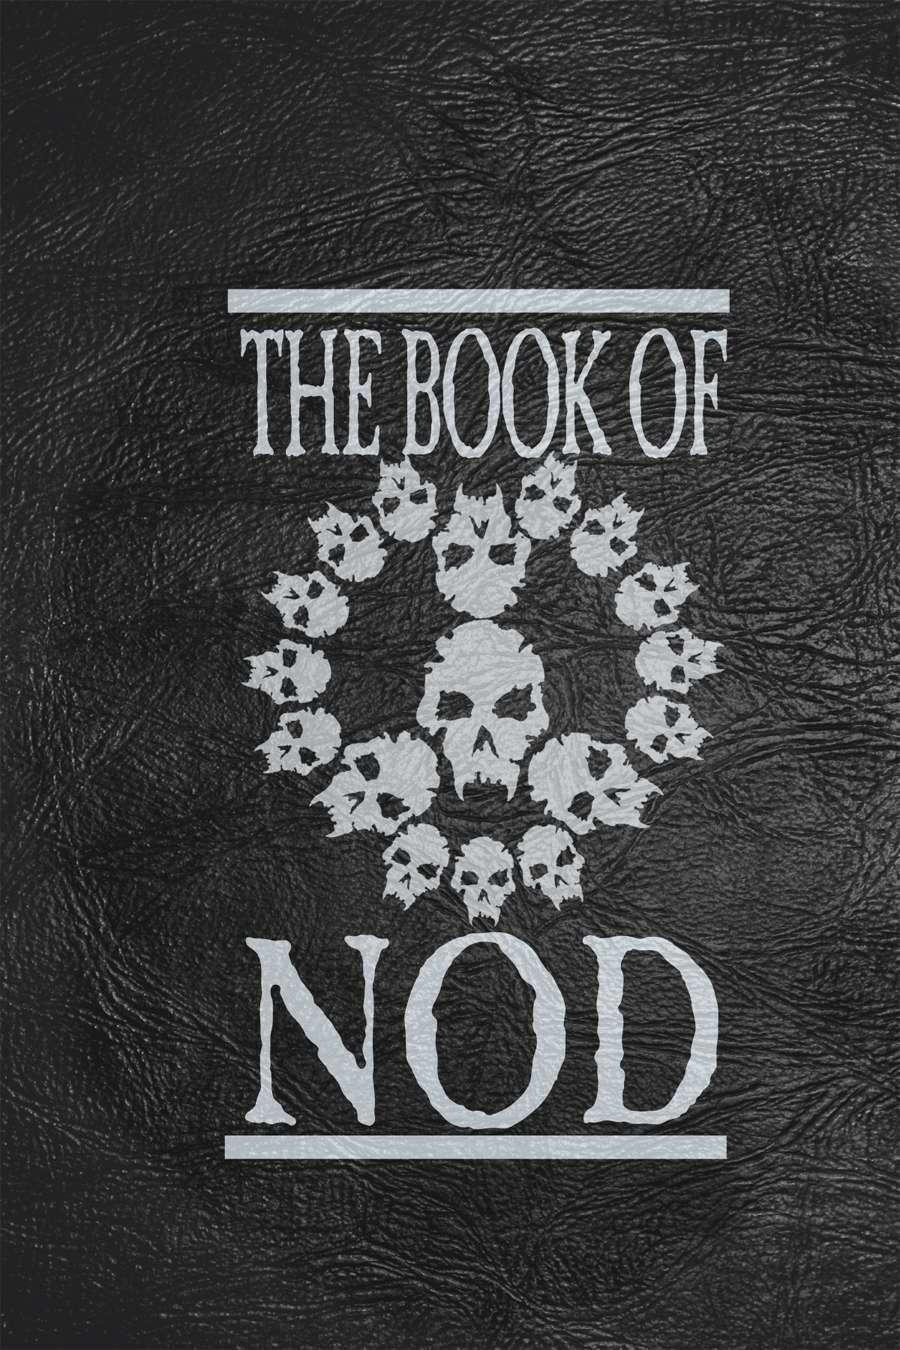 Book of Nod - White Wolf   Mind's Eye Theatre (OWoD)   Vampire: The Masquerade 2nd Edition   Vampire: The Masquerade   DriveThruRPG.com